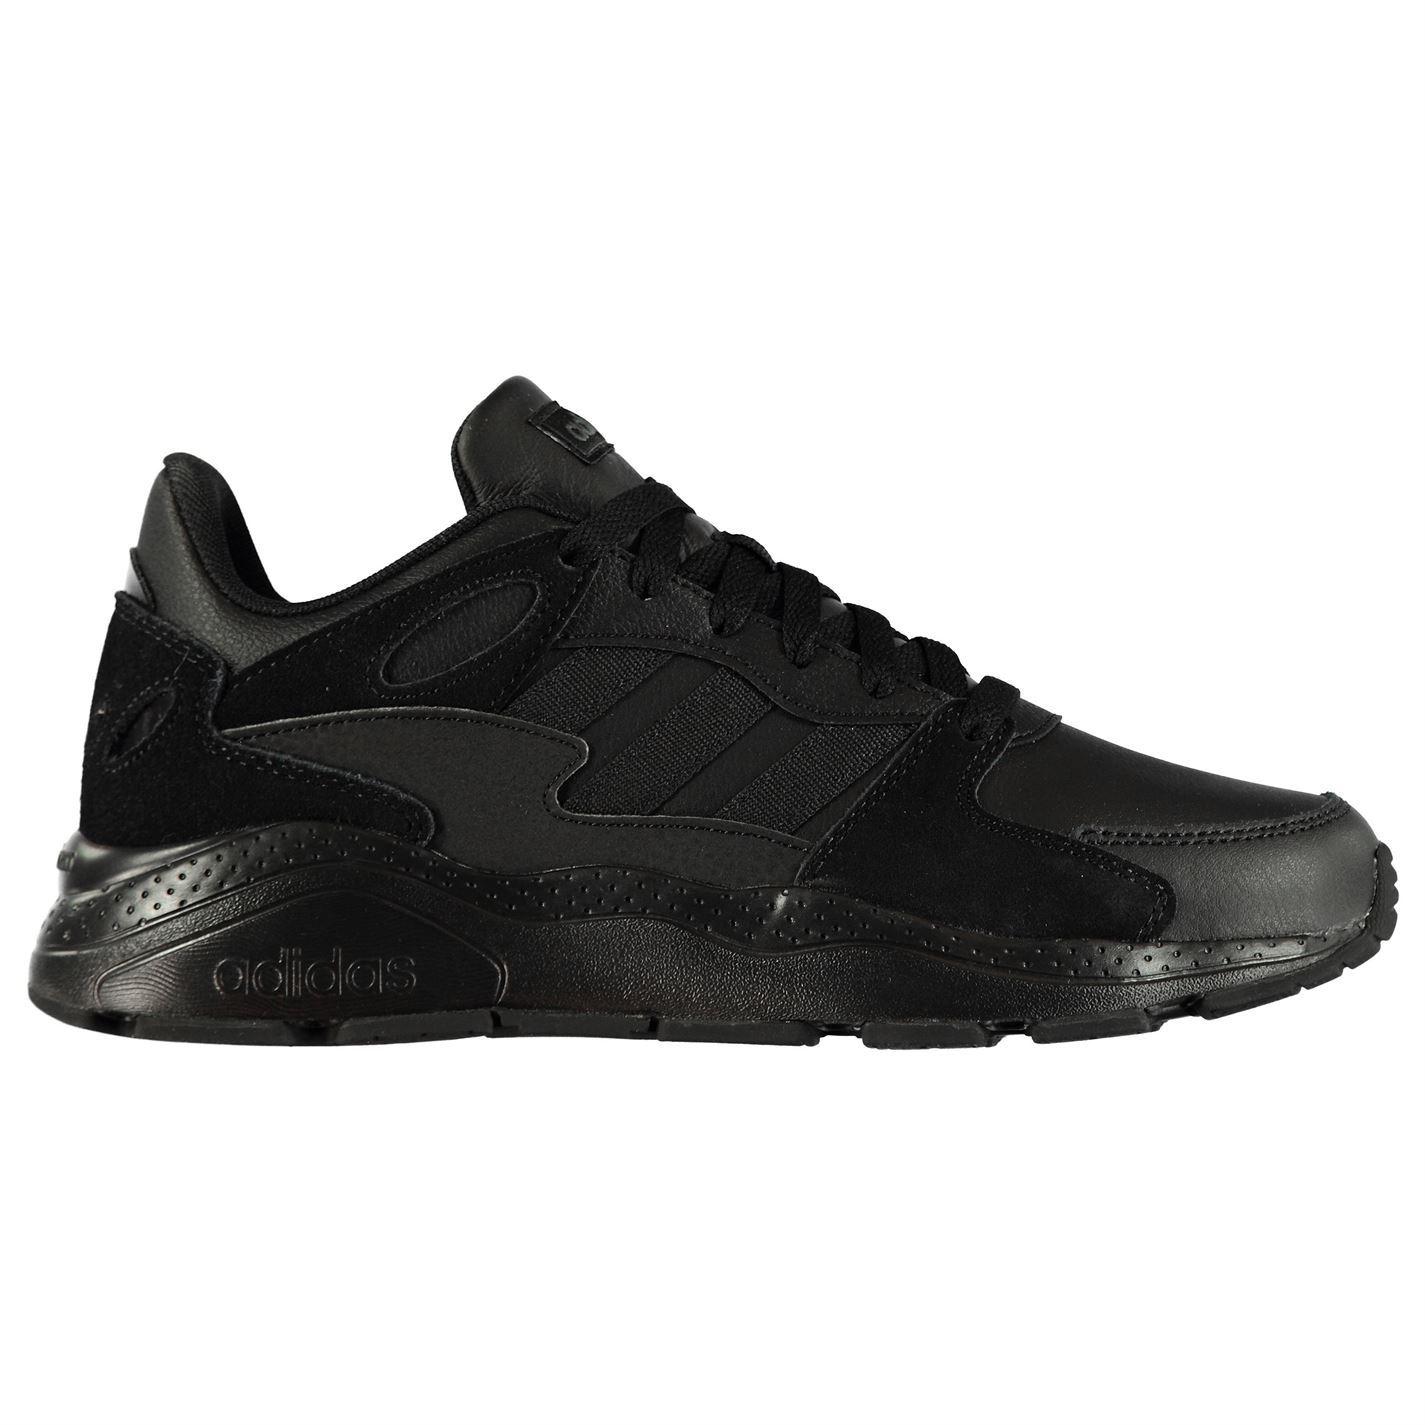 Adidas-Crazychaos-Baskets-Homme-Chaussures-De-Loisirs-Chaussures-Baskets miniature 7